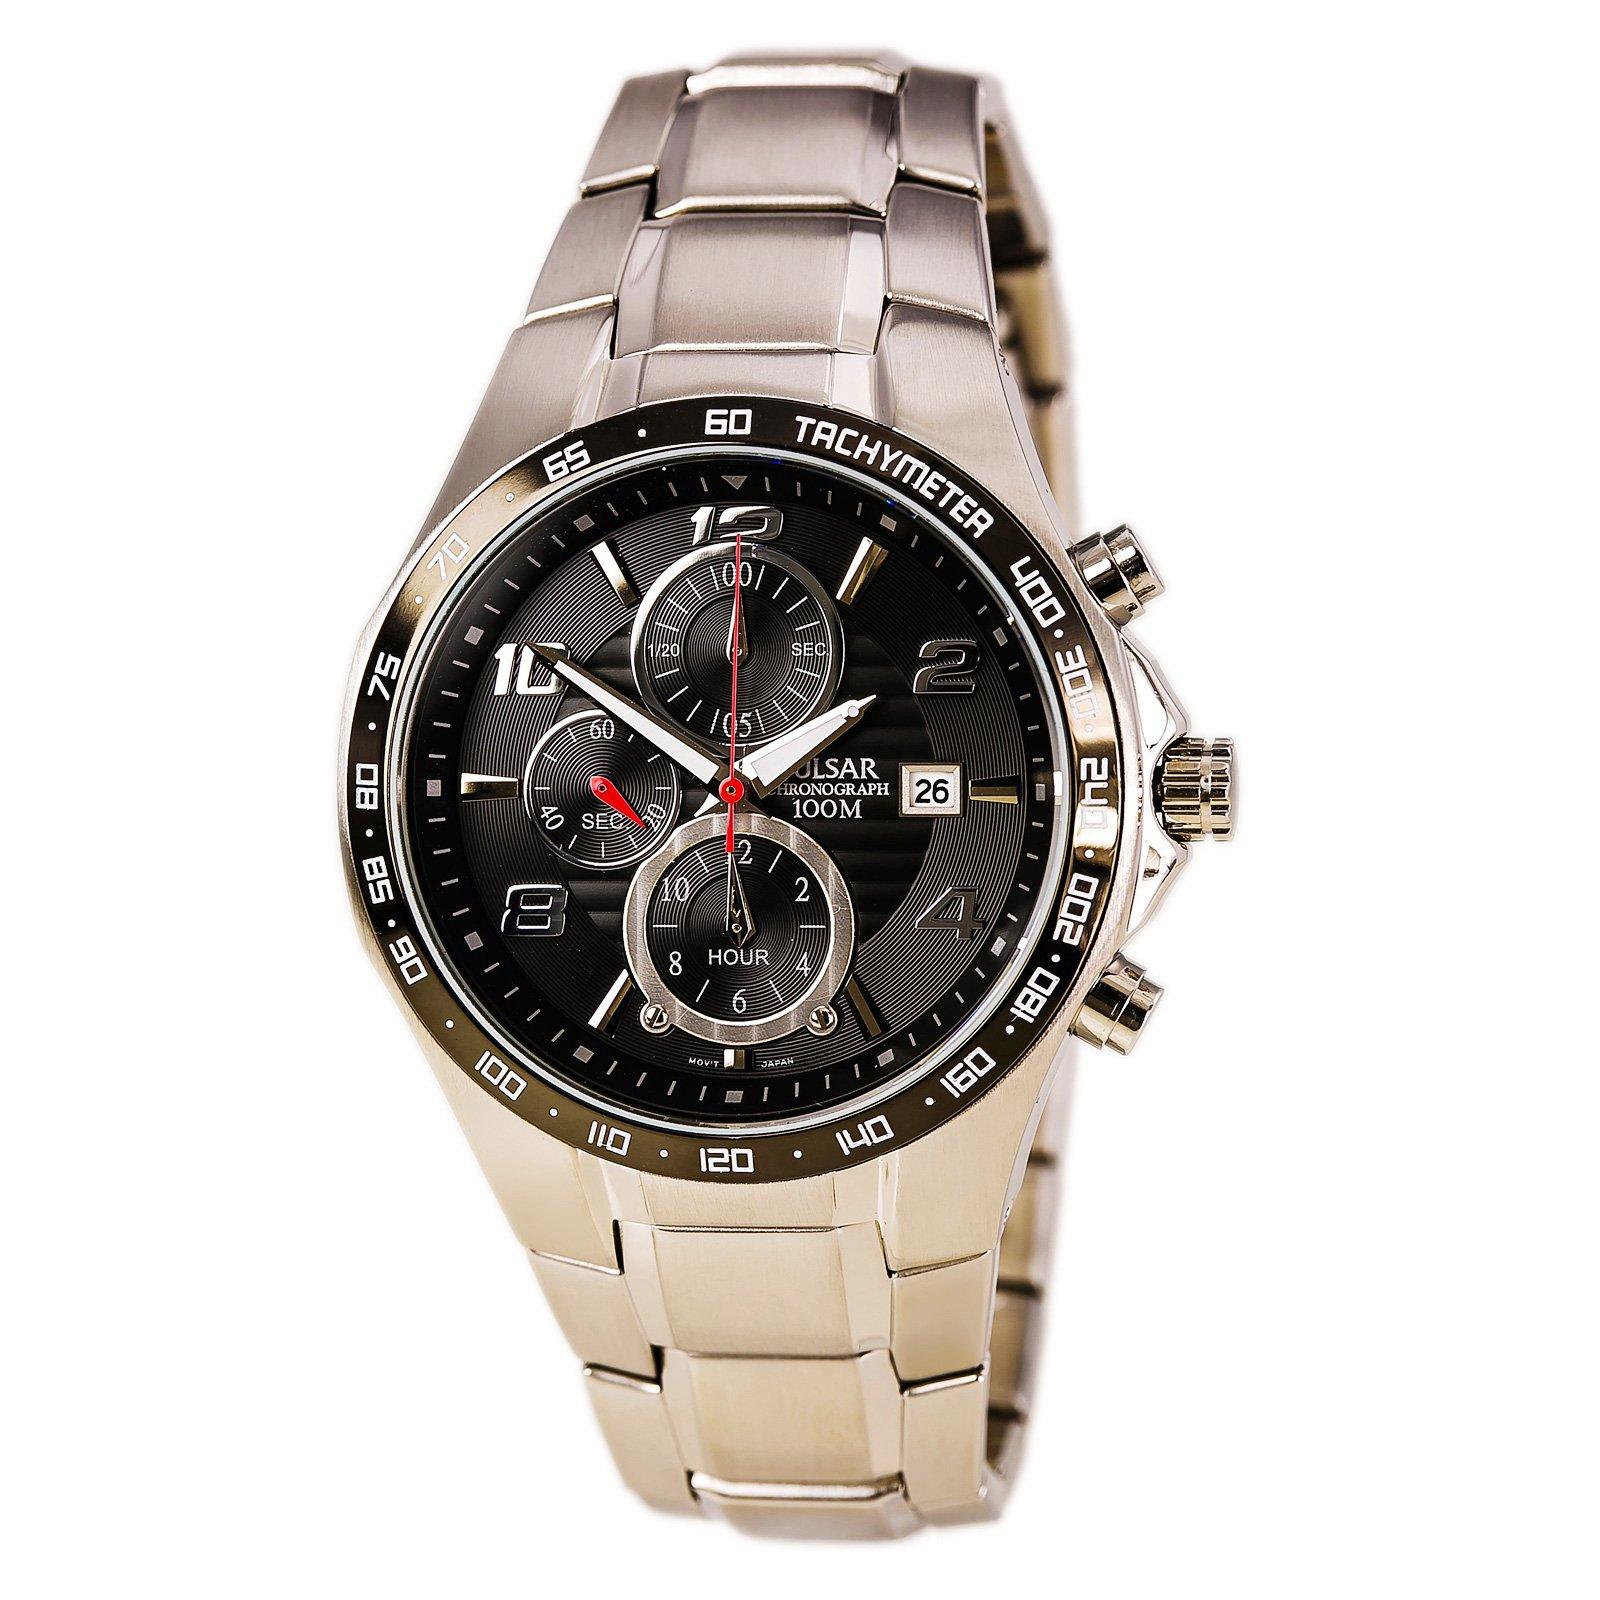 Pulsar by Seiko Mens Black Dial Quartz Chronograph Dress Bracelet Watch PF8373 by Pulsar